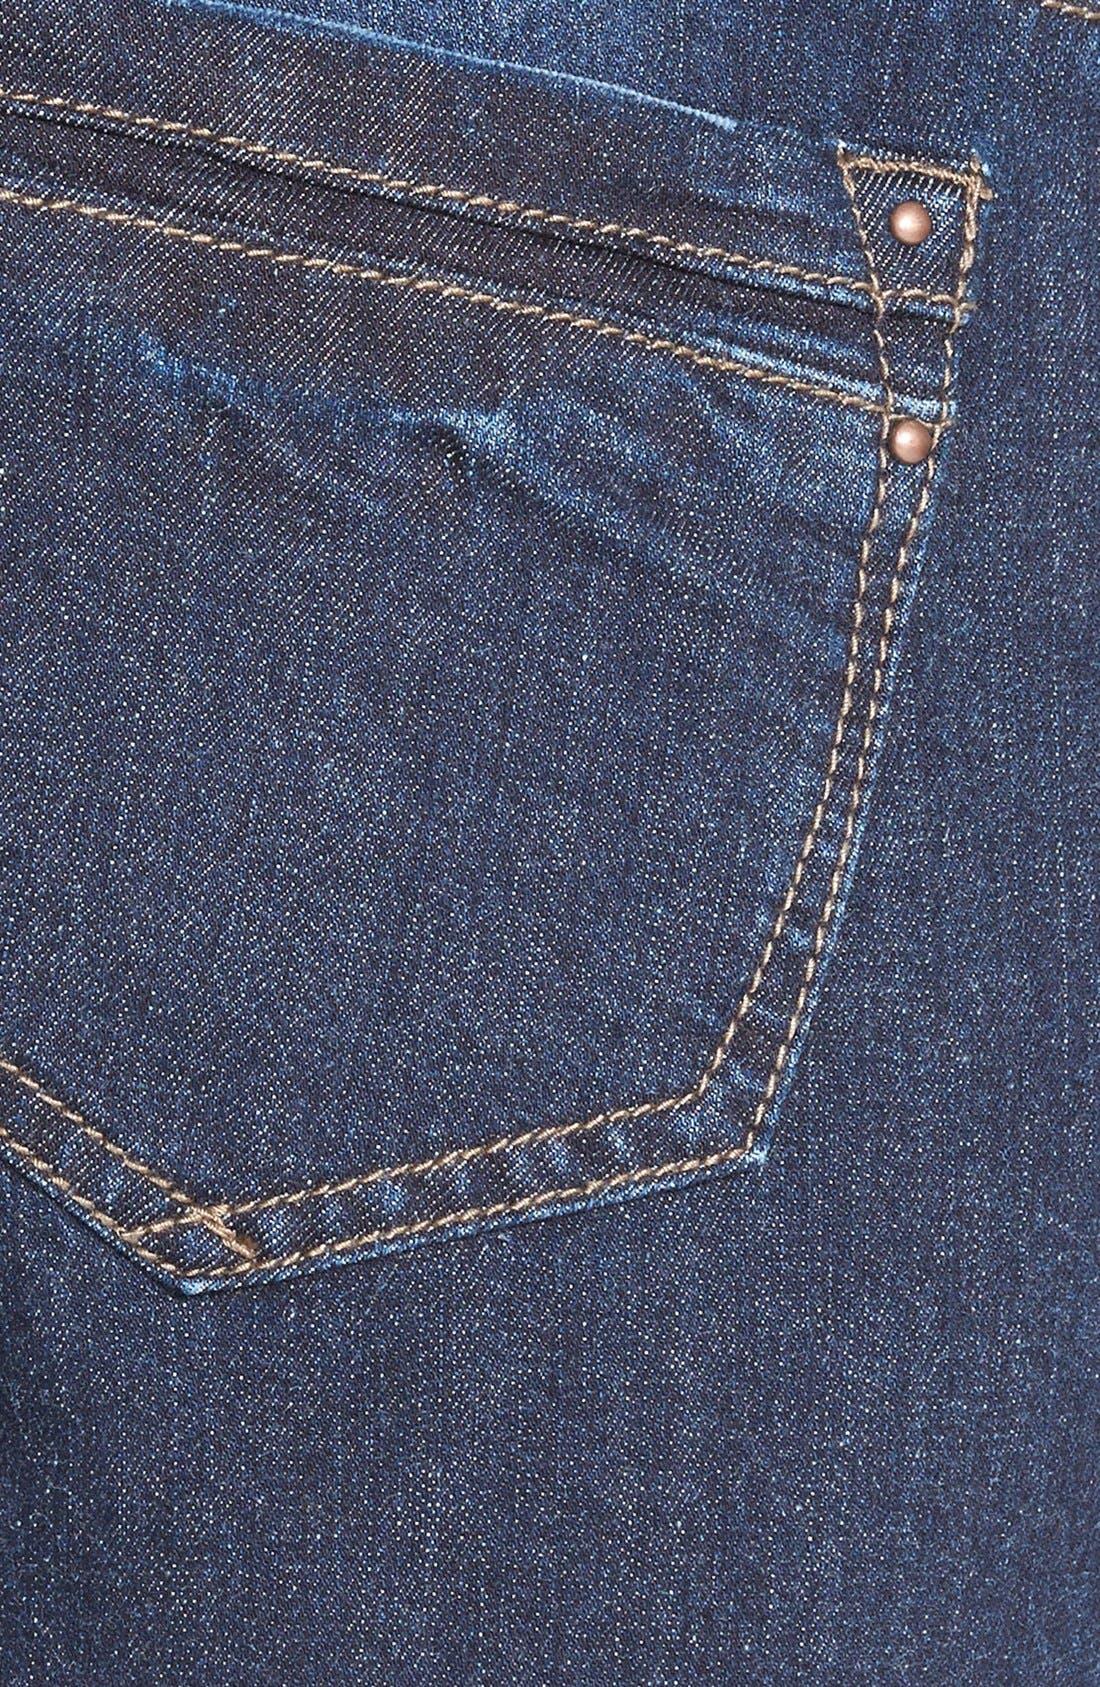 Alternate Image 3  - HART Denim 'Leigh' Destroyed Patched Skinny Jeans (Dark Wash)